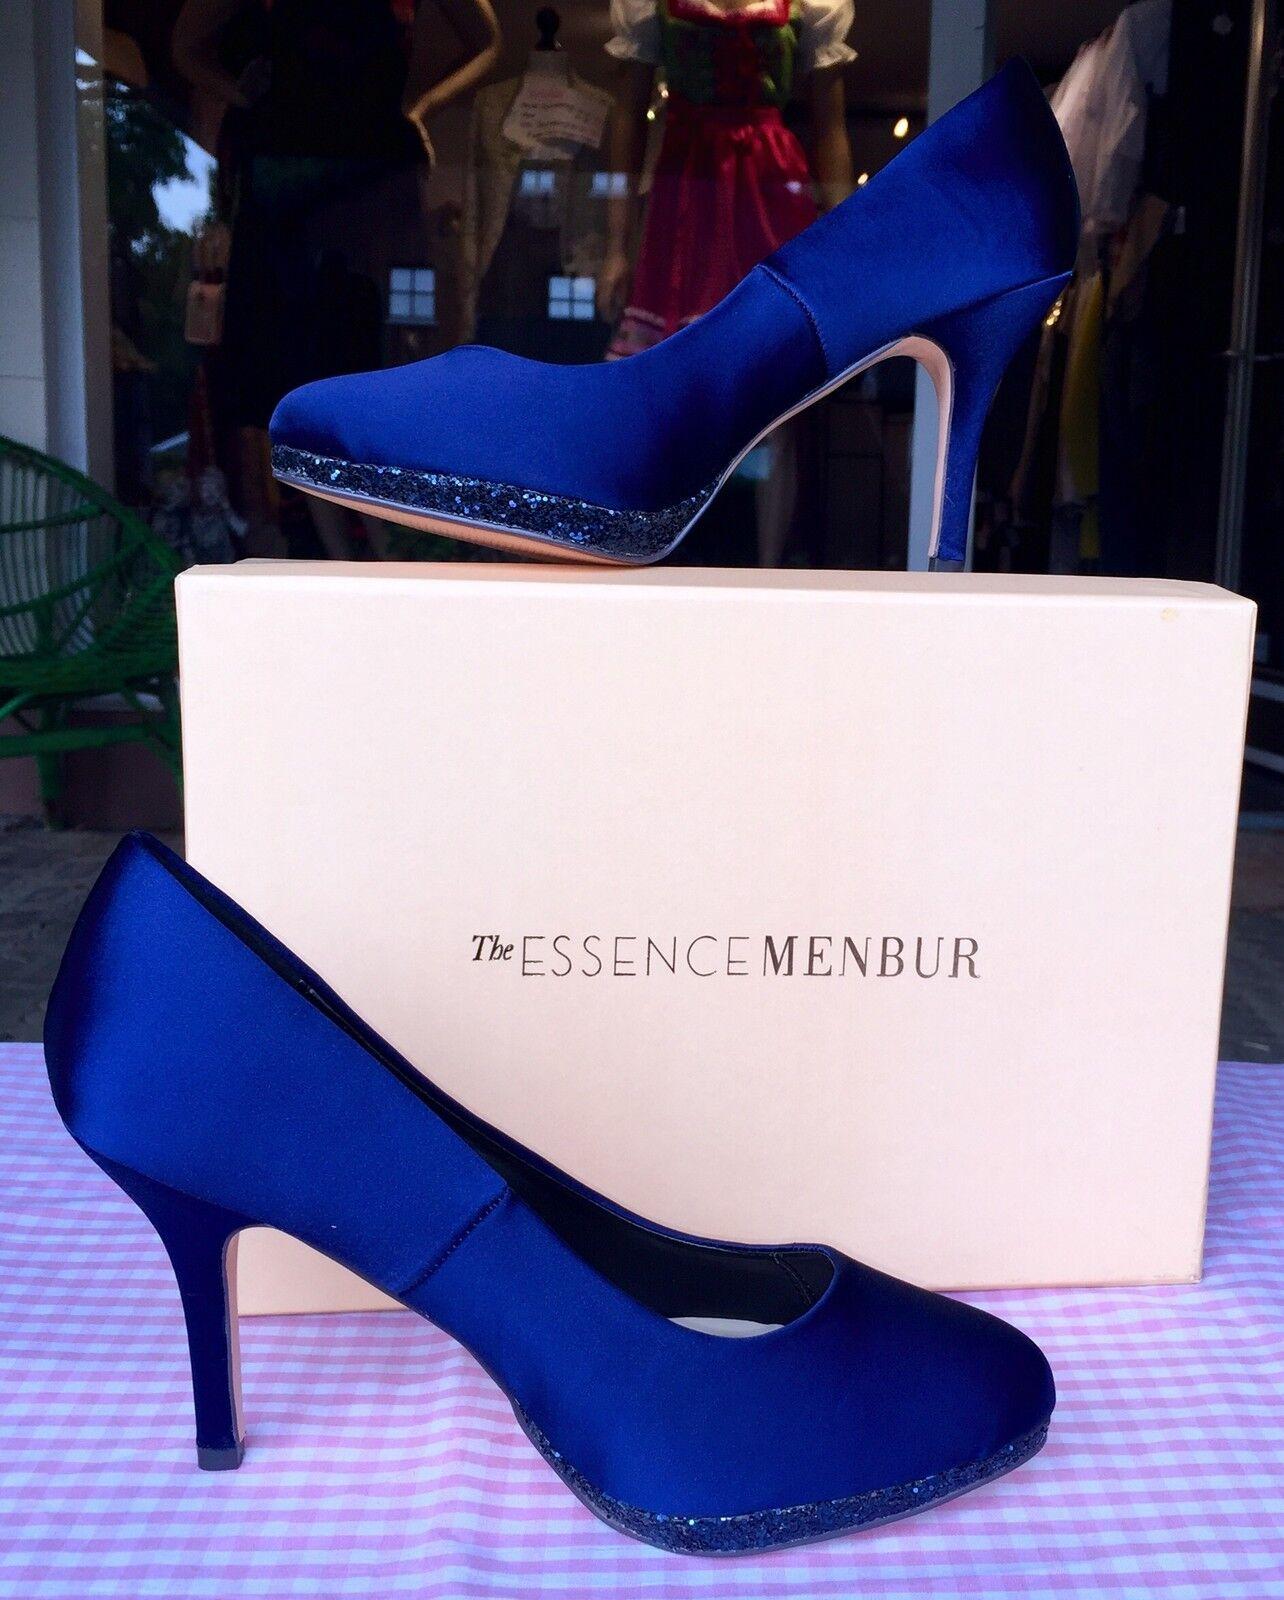 Pumps, Stilettos Menbur, Gr. 36, blau, satin, Essence Menbur, Stilettos Glitzer Schuhe, königsblau b02c6c